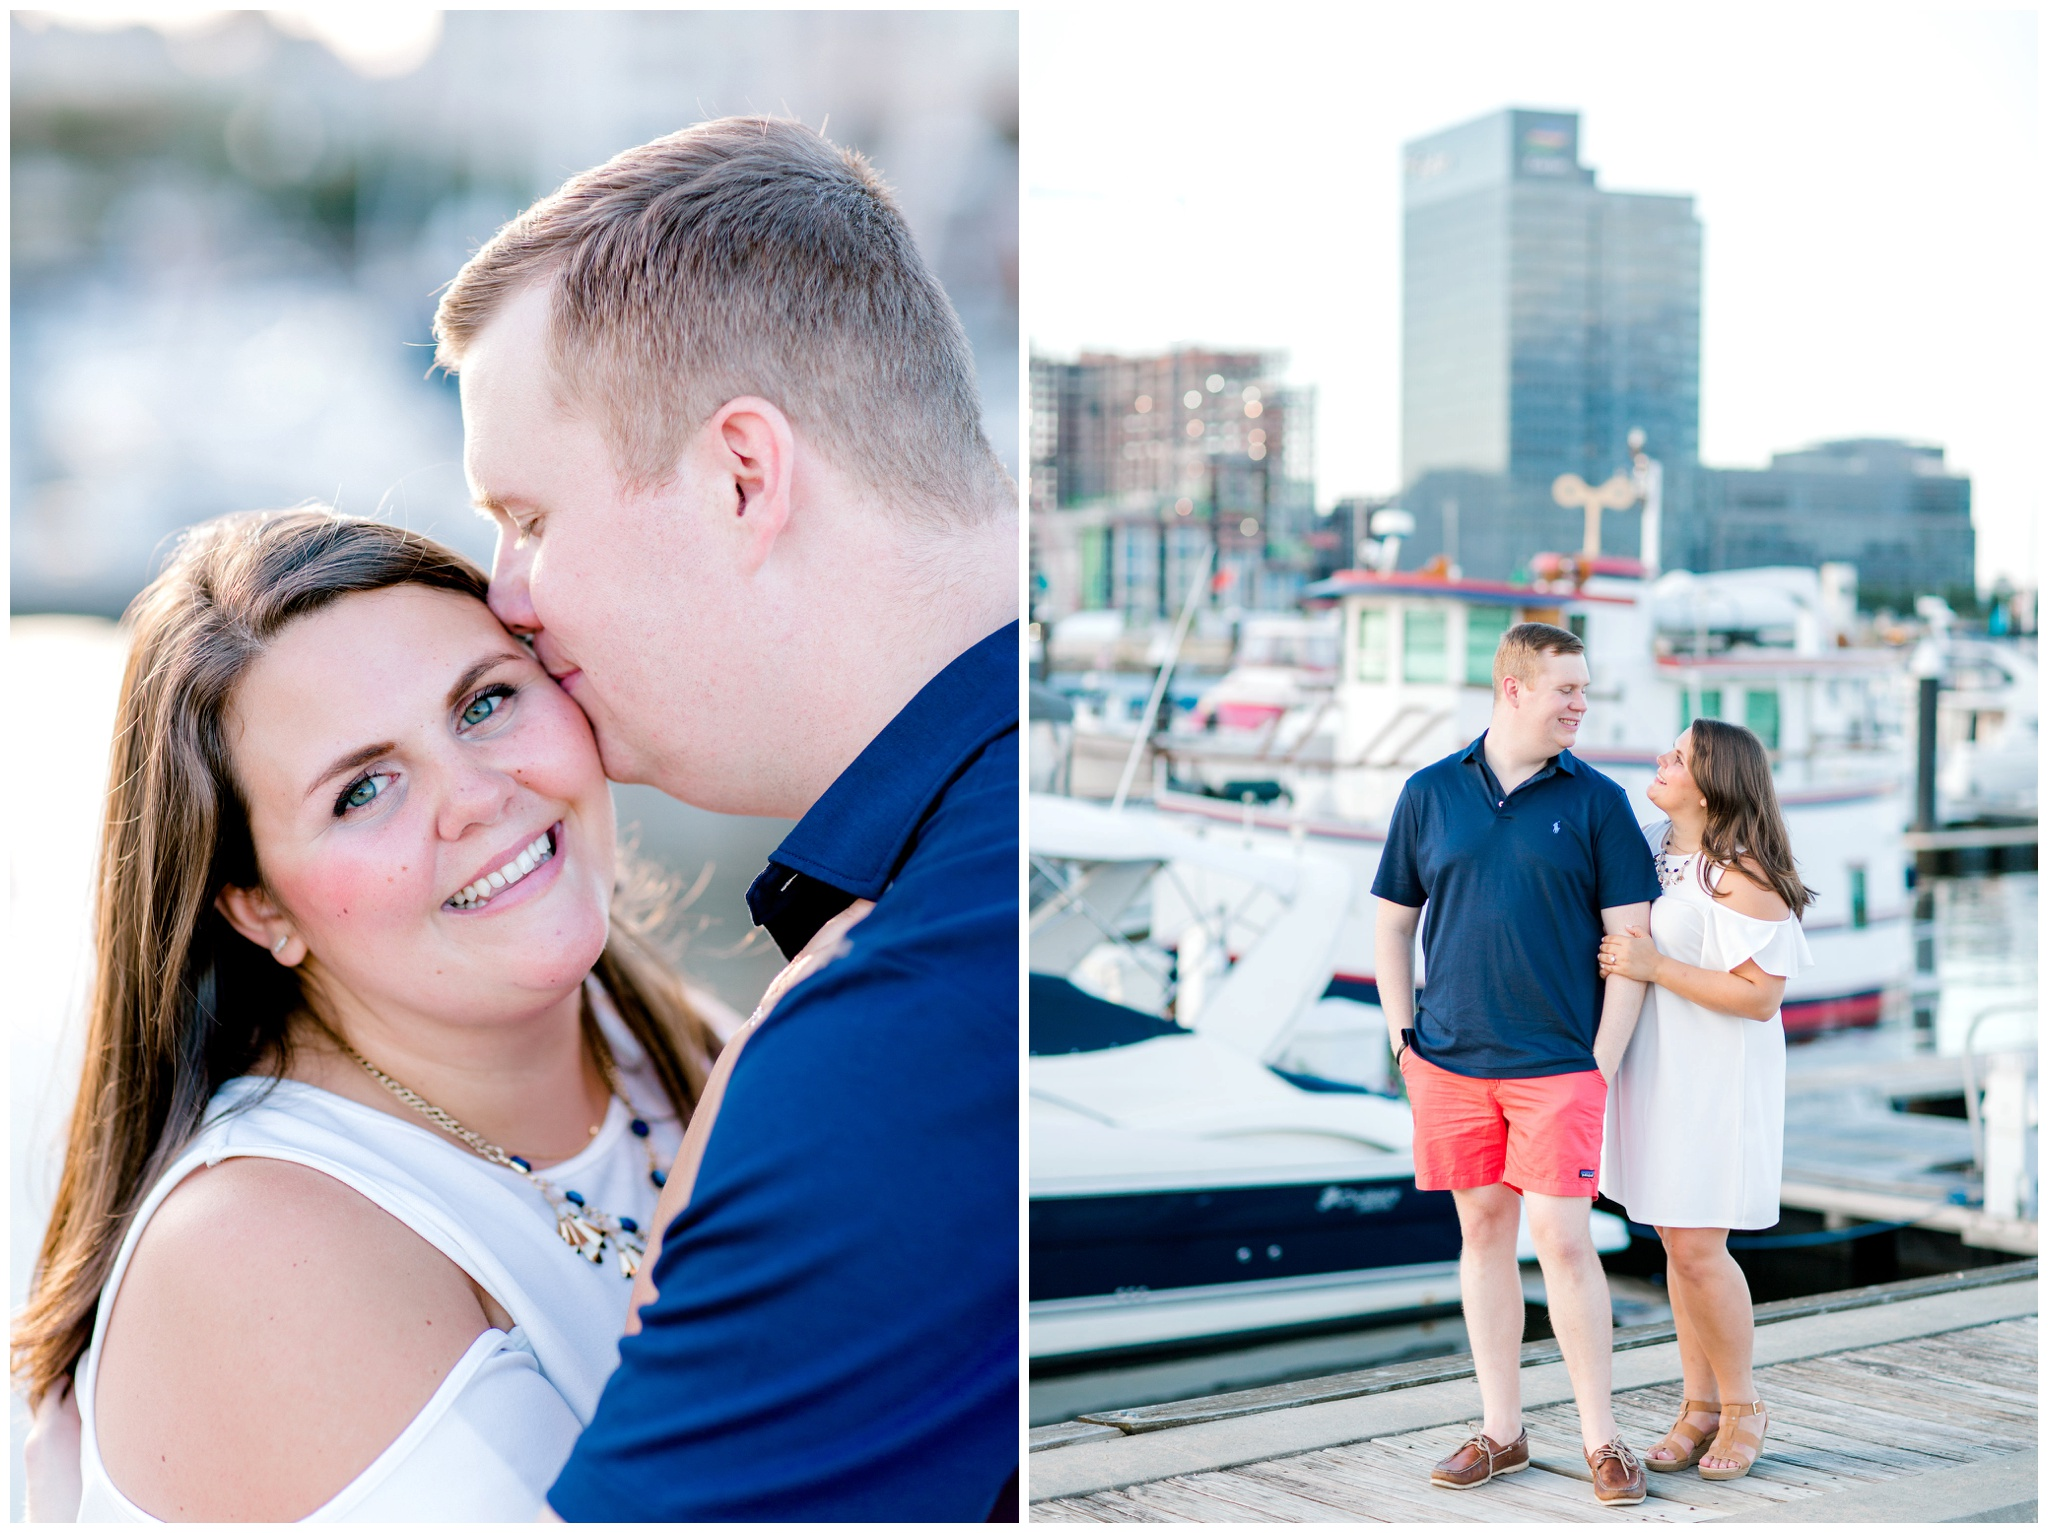 Baltimore Harbor Engagement, baltimore engagement, baltimore harbor, baltimore wedding photographer, maryland wedding photographer, dc wedding photographer, baltimore engagement photographer